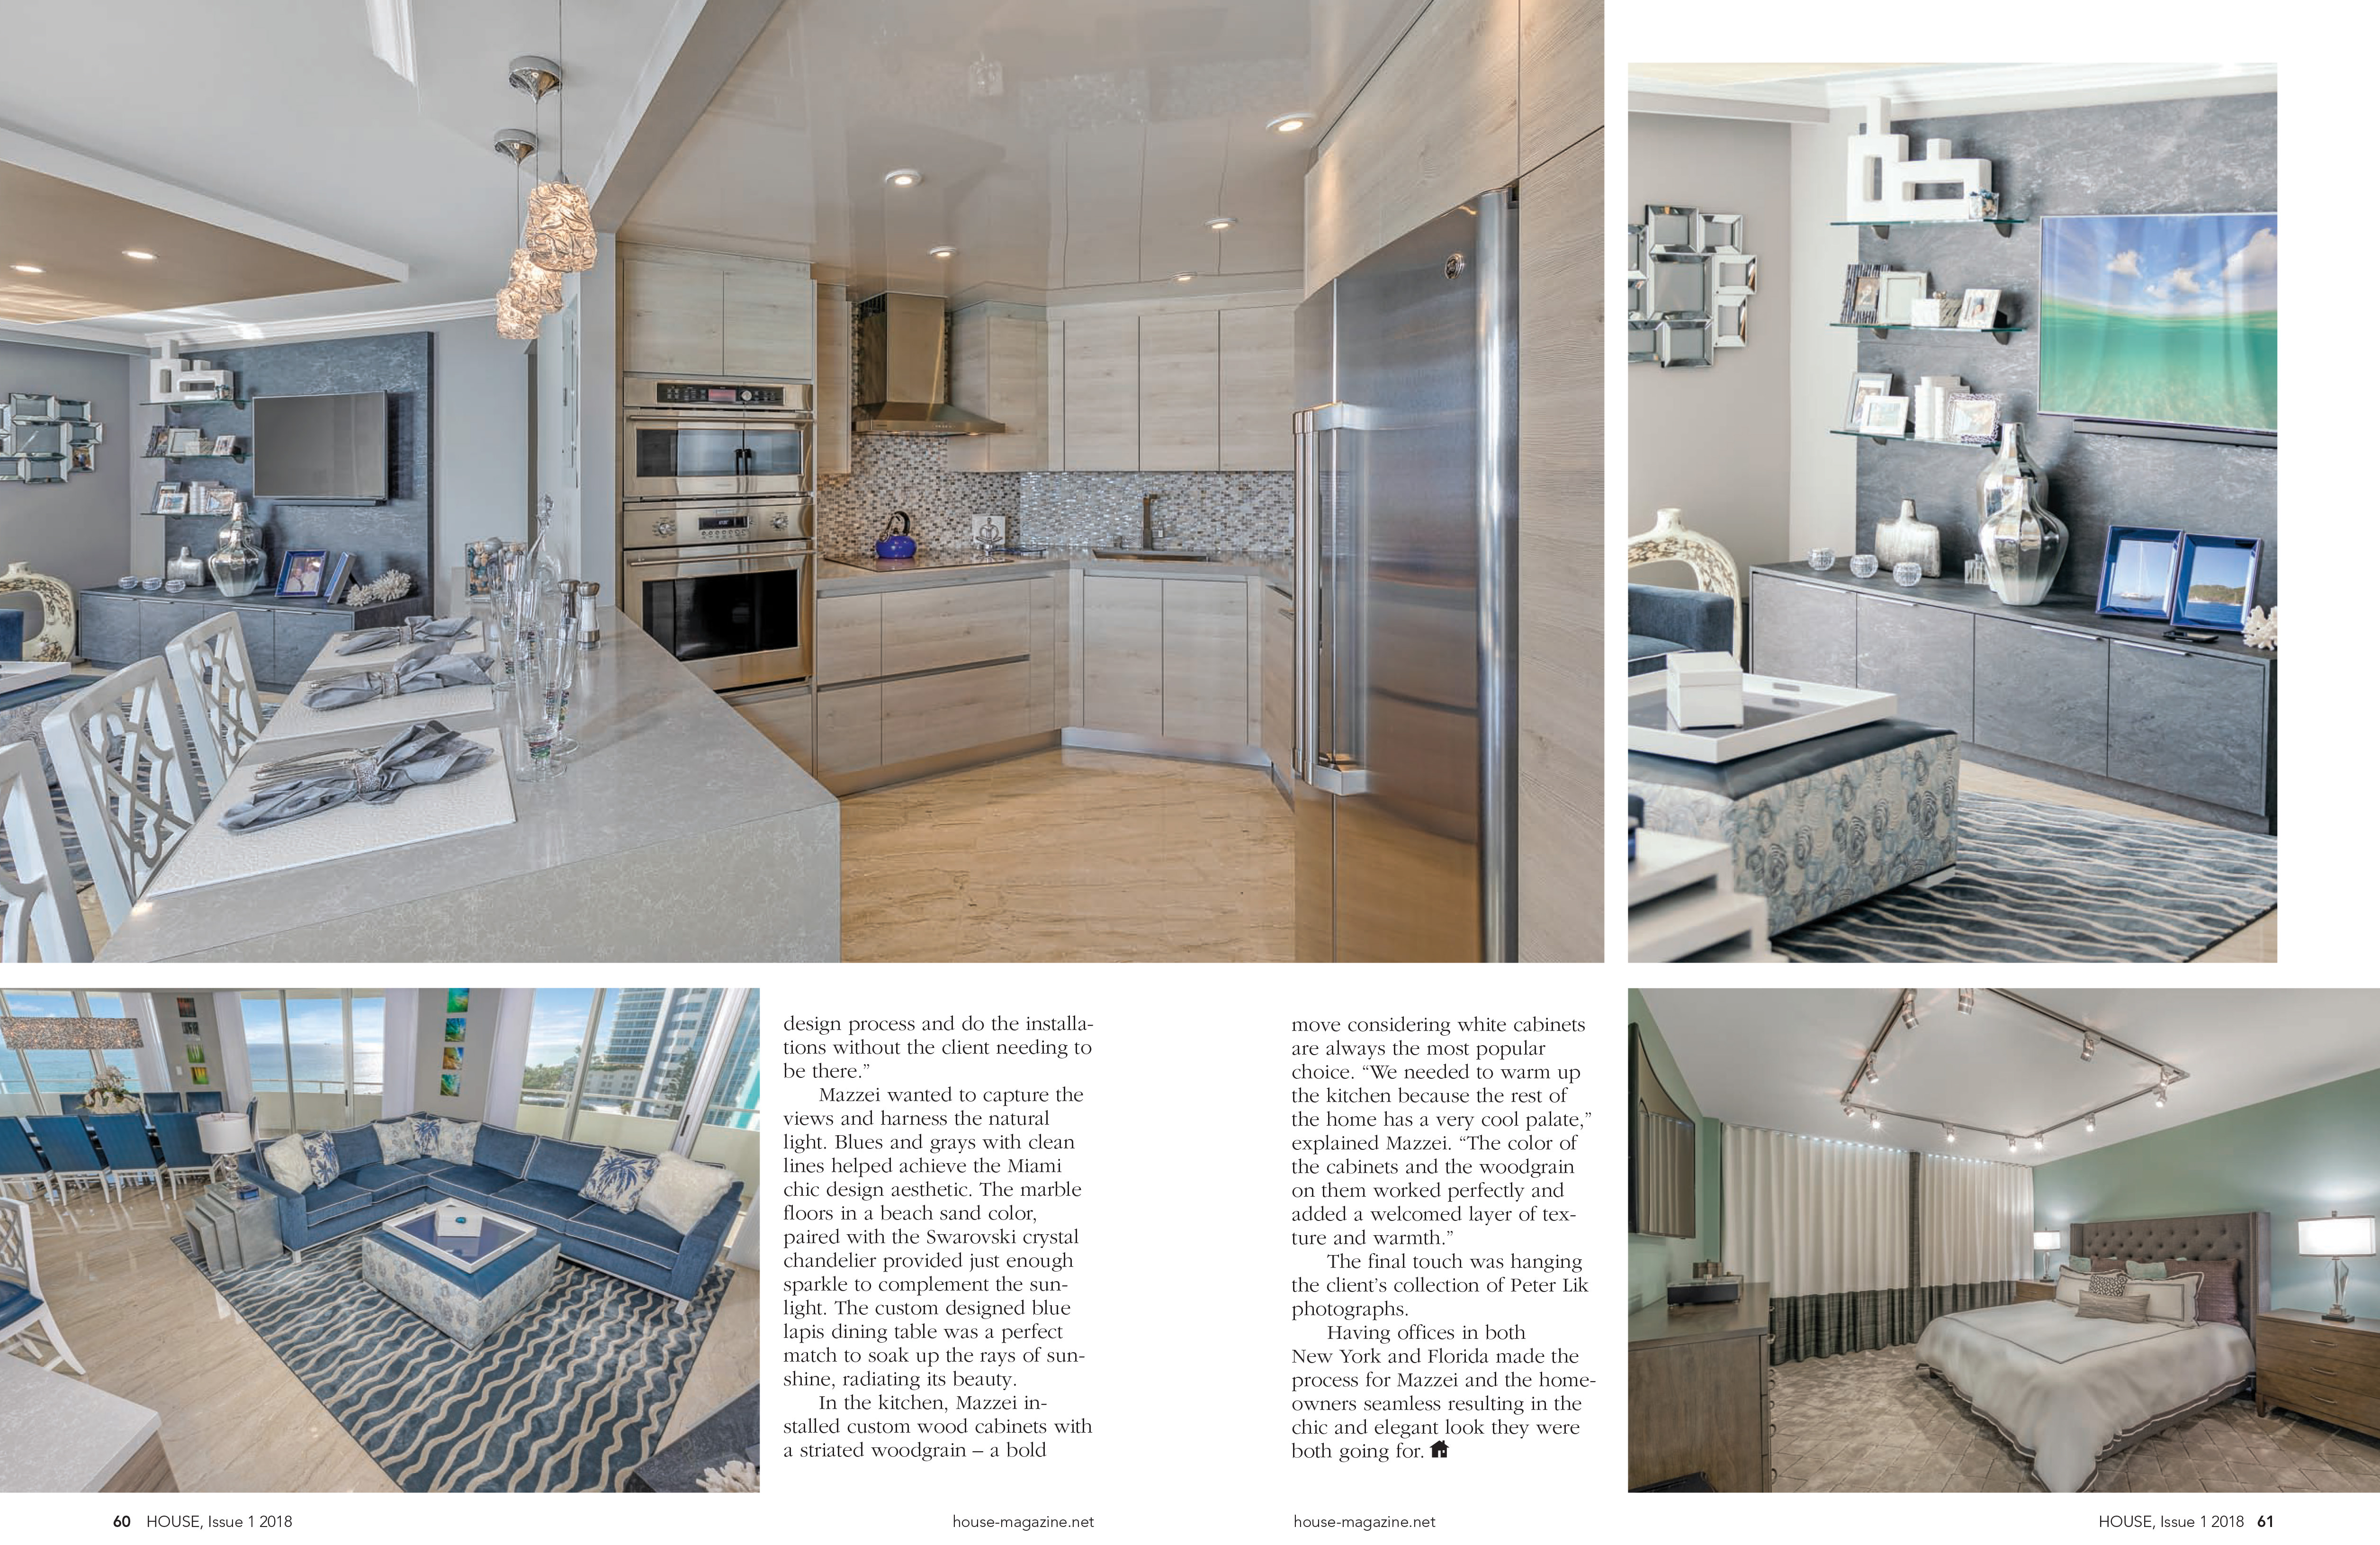 Interior Designer Keith Mazzei published into House Magazine